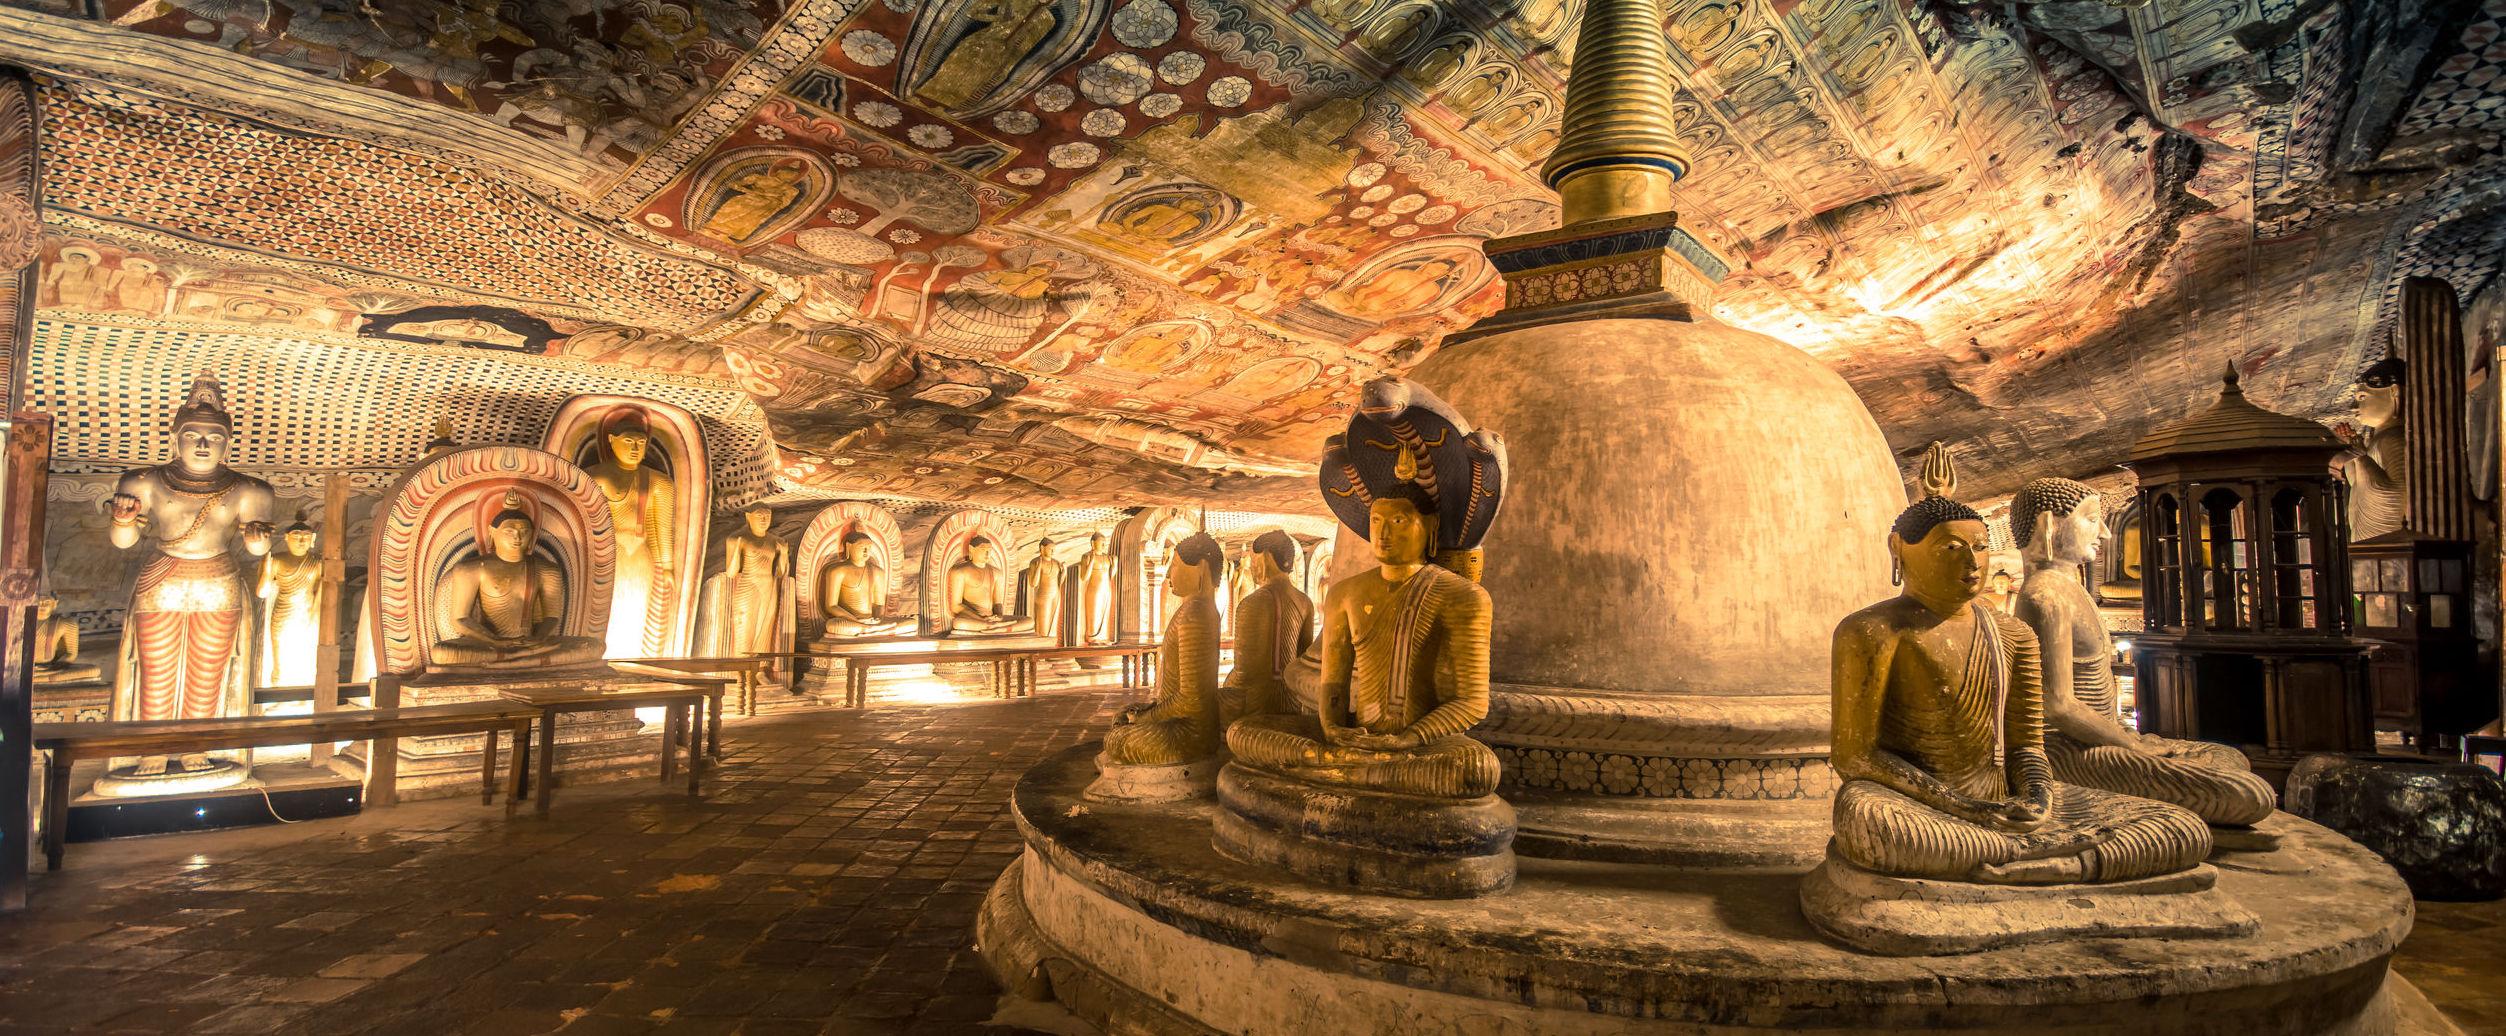 caverns-dambulla-sri-lanka